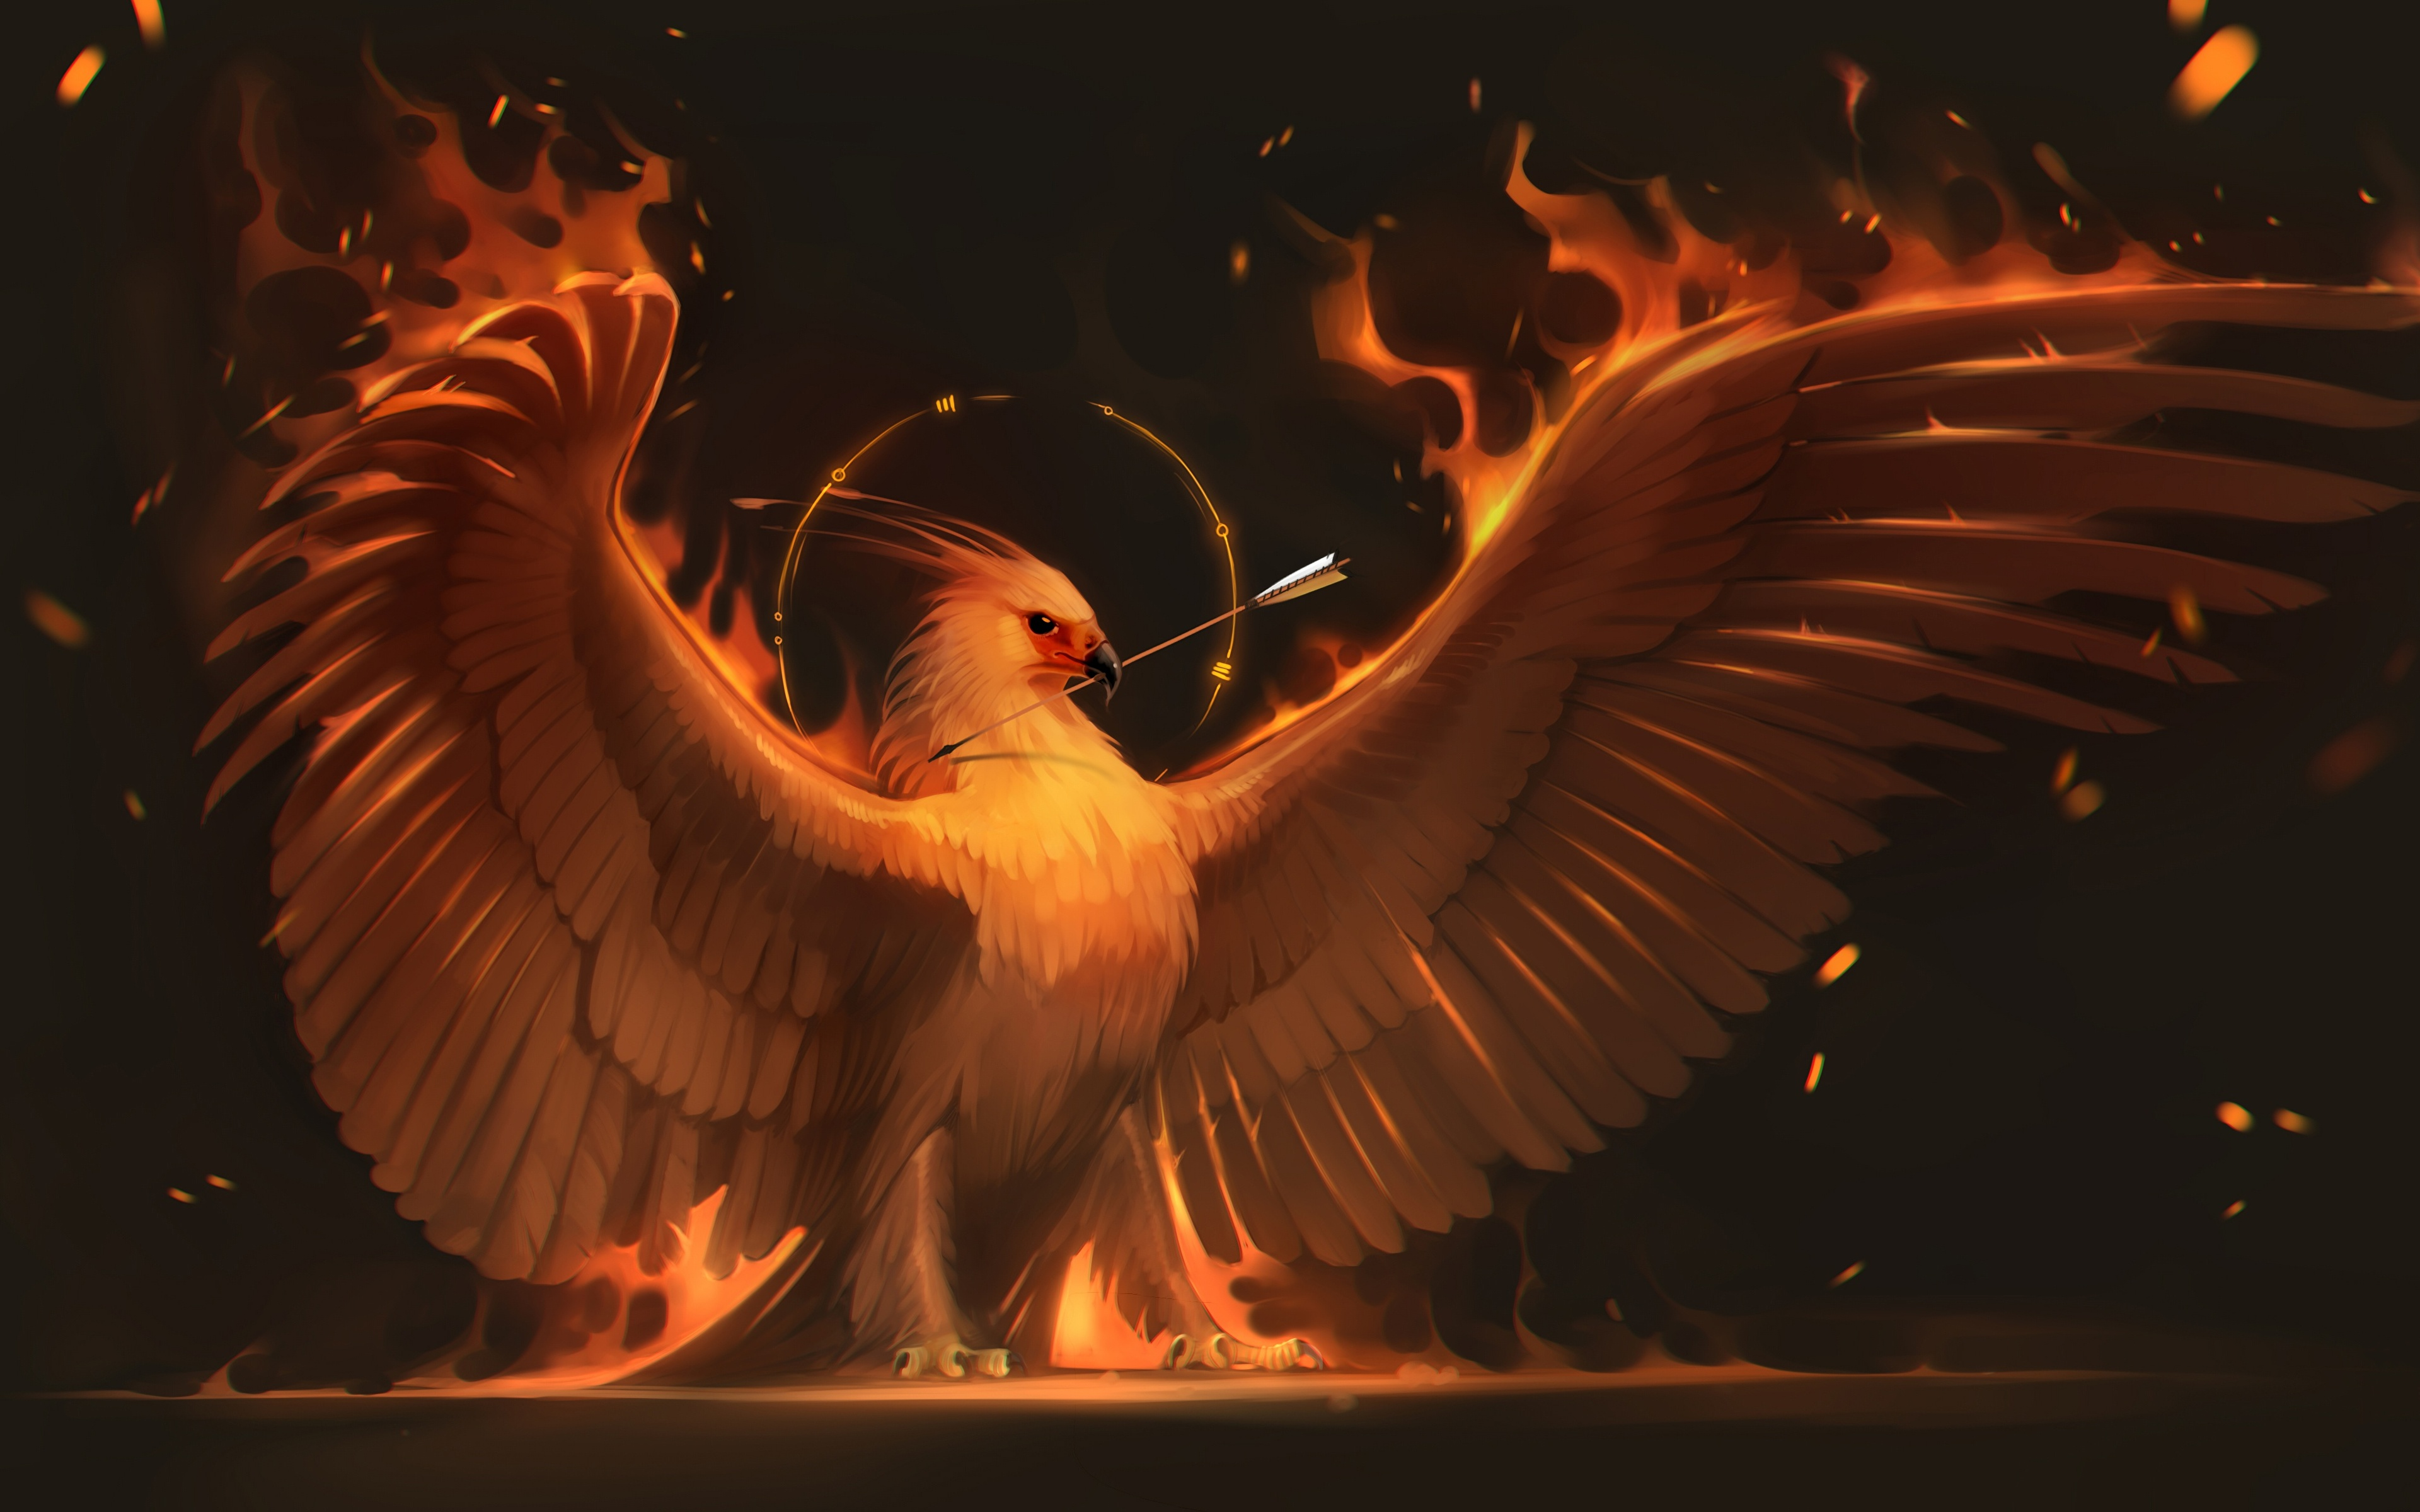 Wallpapers Birds Phoenix mythology Wings Fantasy Flame 3840x2400 3840x2400